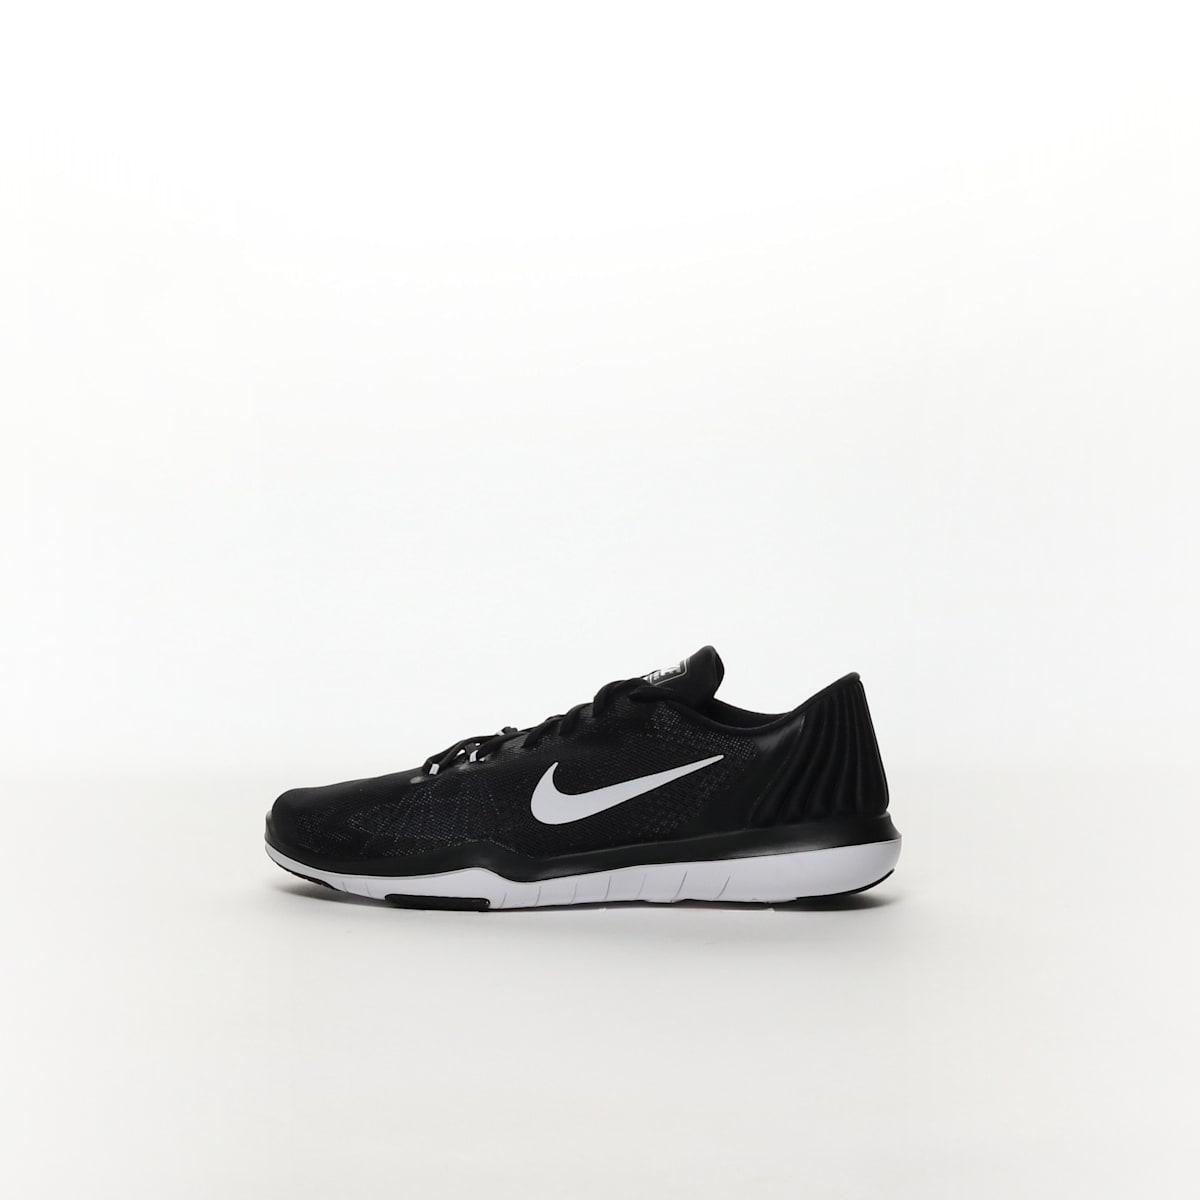 9e2edab6df0a Women s Nike Flex Supreme TR 5 Training Shoe - BLACK WHITE – Resku